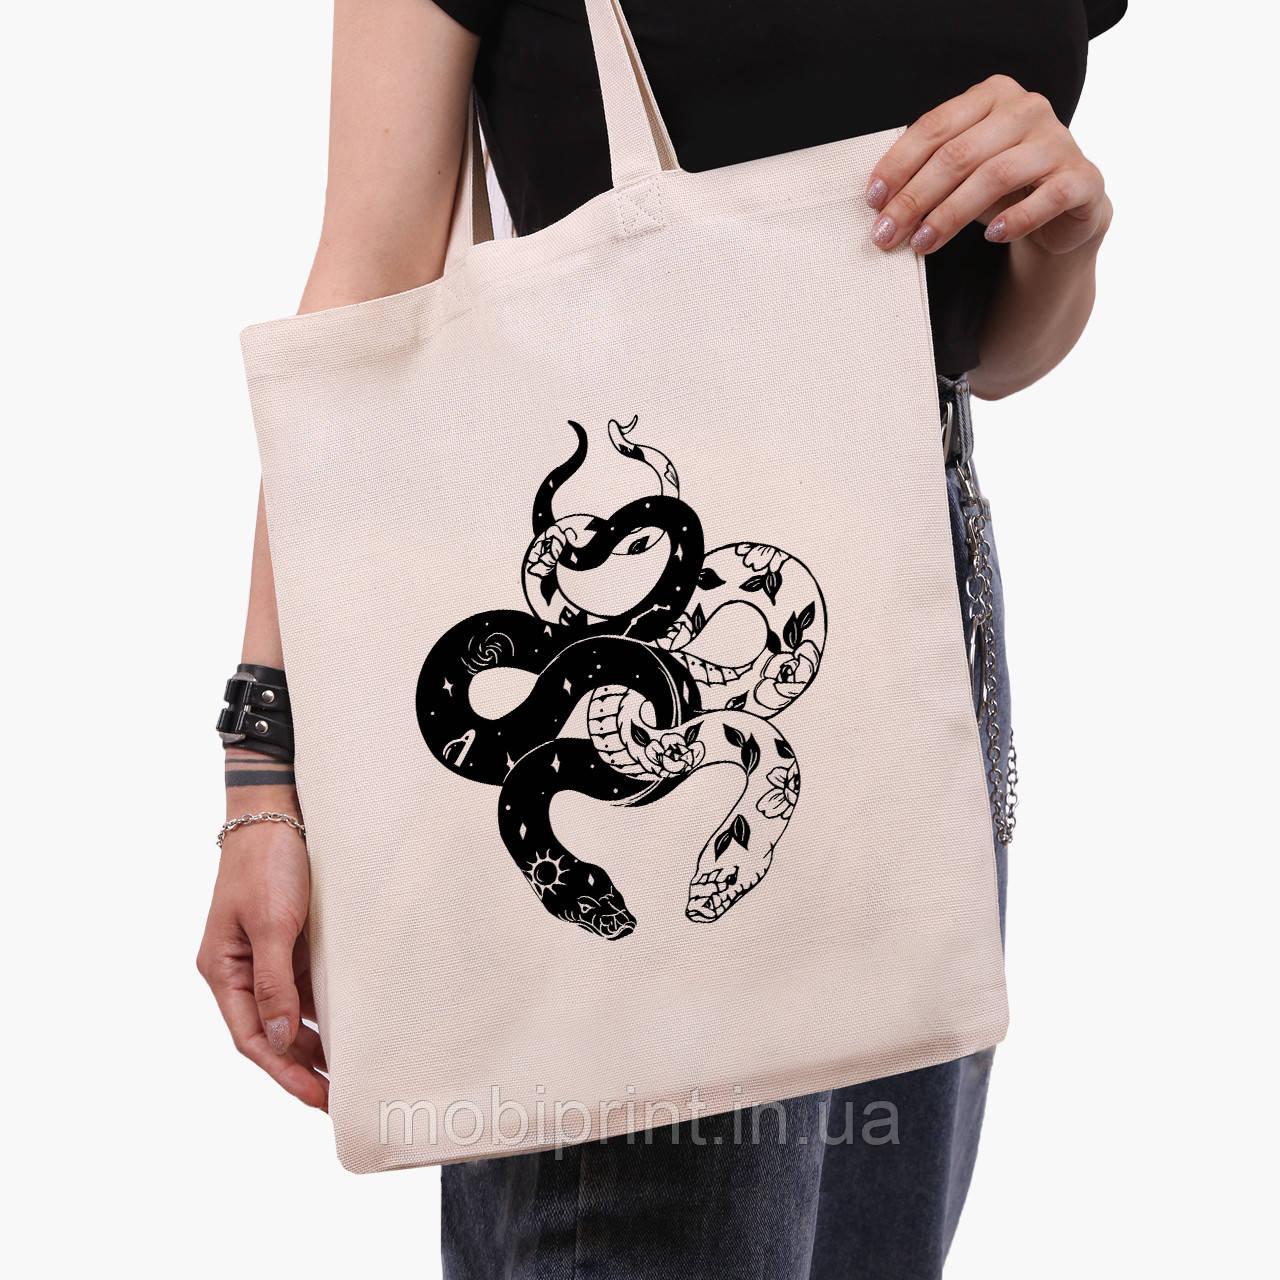 Эко сумка шоппер Инь Янь Змеи (Yin Yang Snake) (9227-2850)  41*35 см